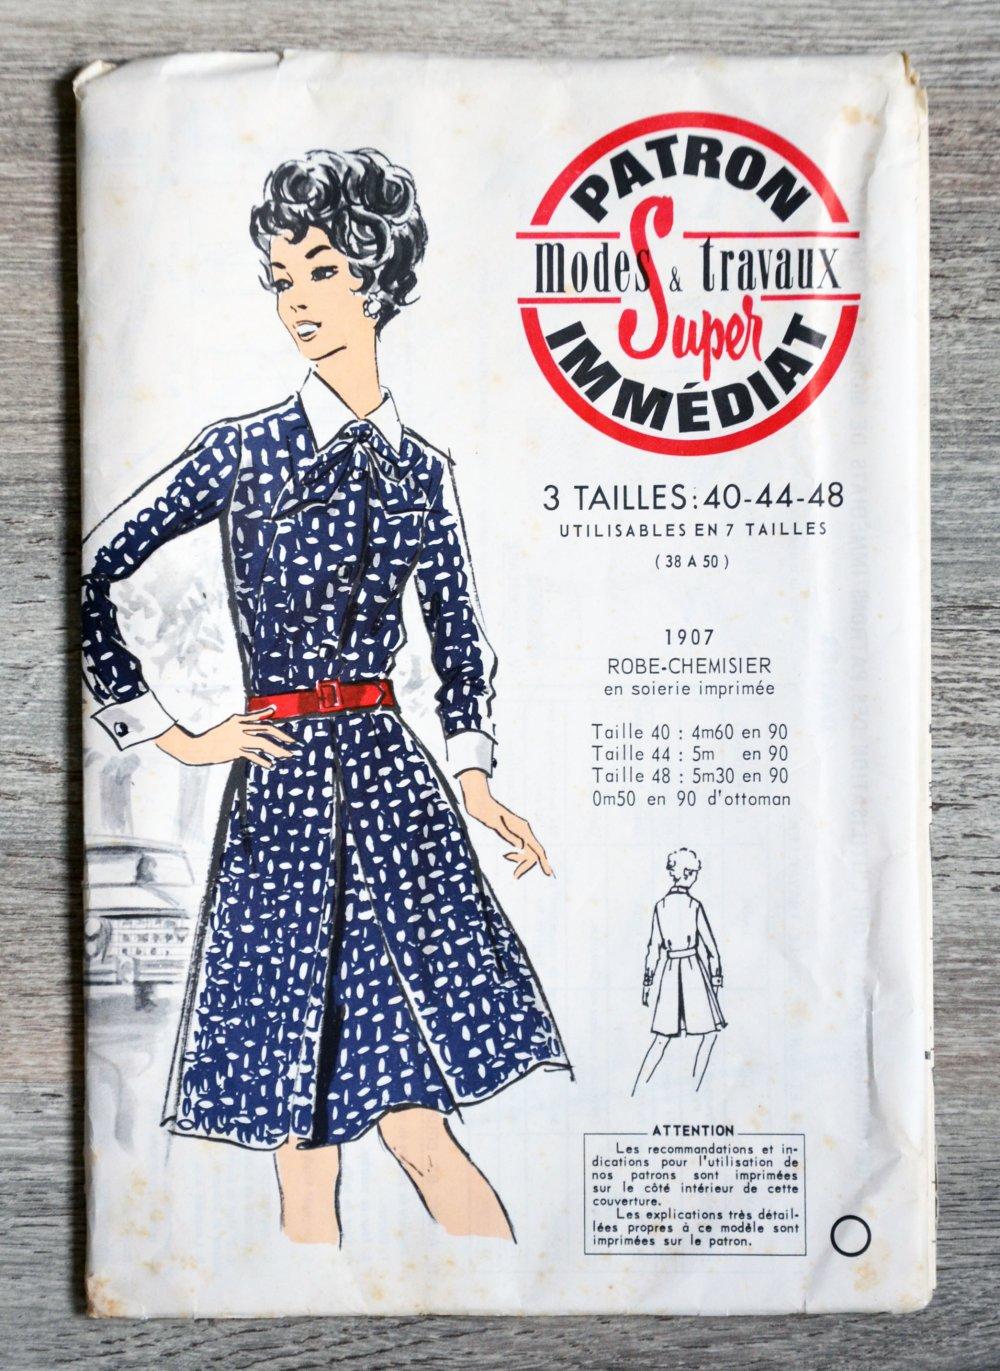 Patron Modes & Travaux 1907 - Robe-chemisier (Vintage)